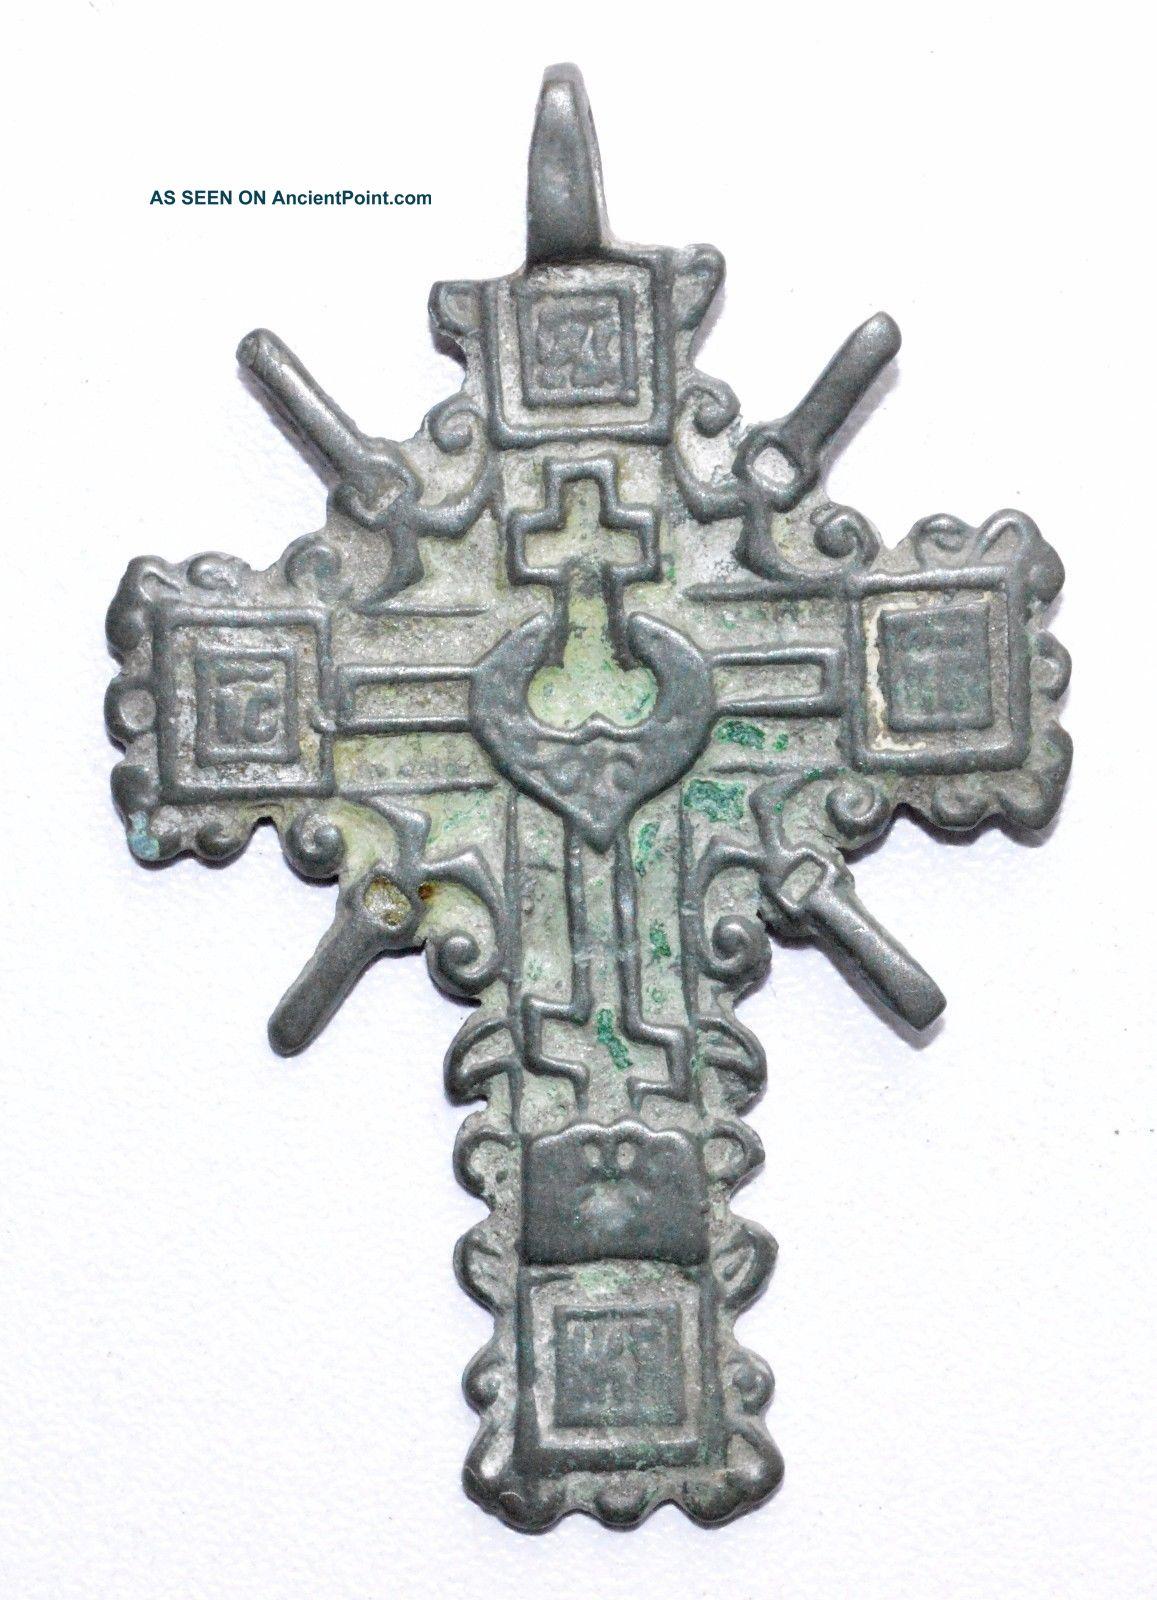 Late Medieval Bronze Enameled Radiate Cross Pendant - Wearable Artifact - St13 Roman photo